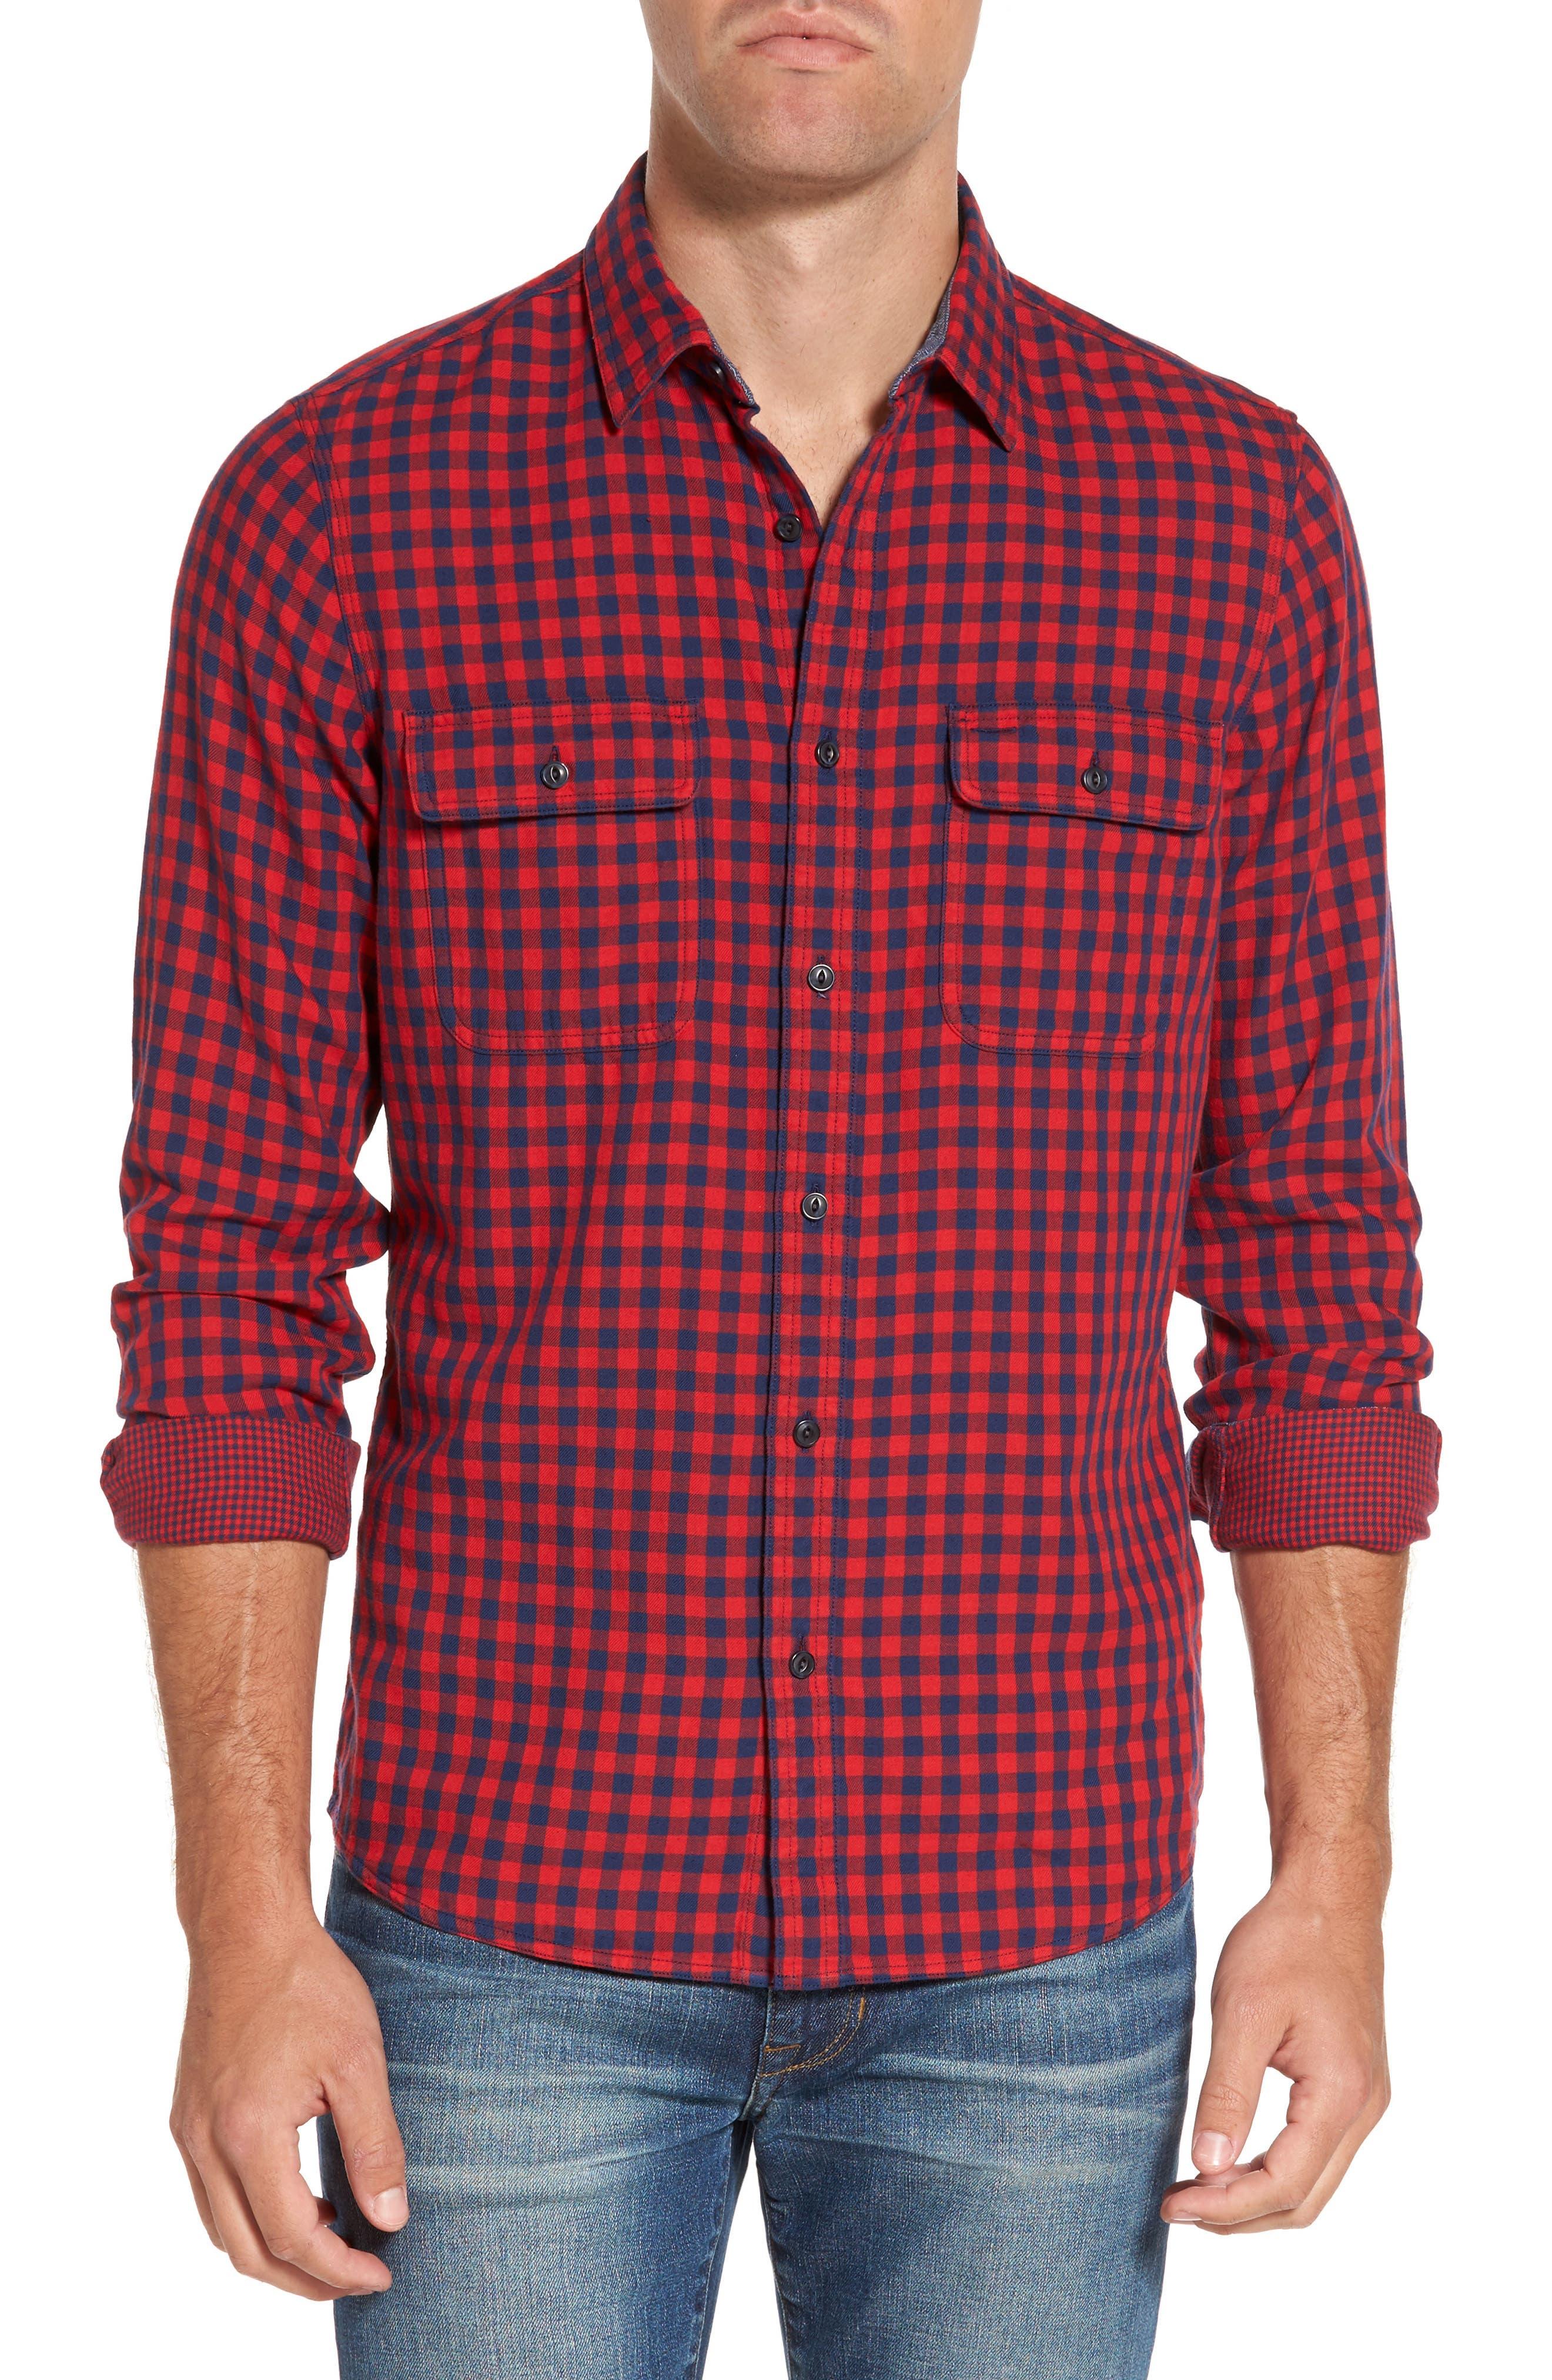 Buffalo Check Trim Fit Sport Shirt,                             Main thumbnail 1, color,                             610